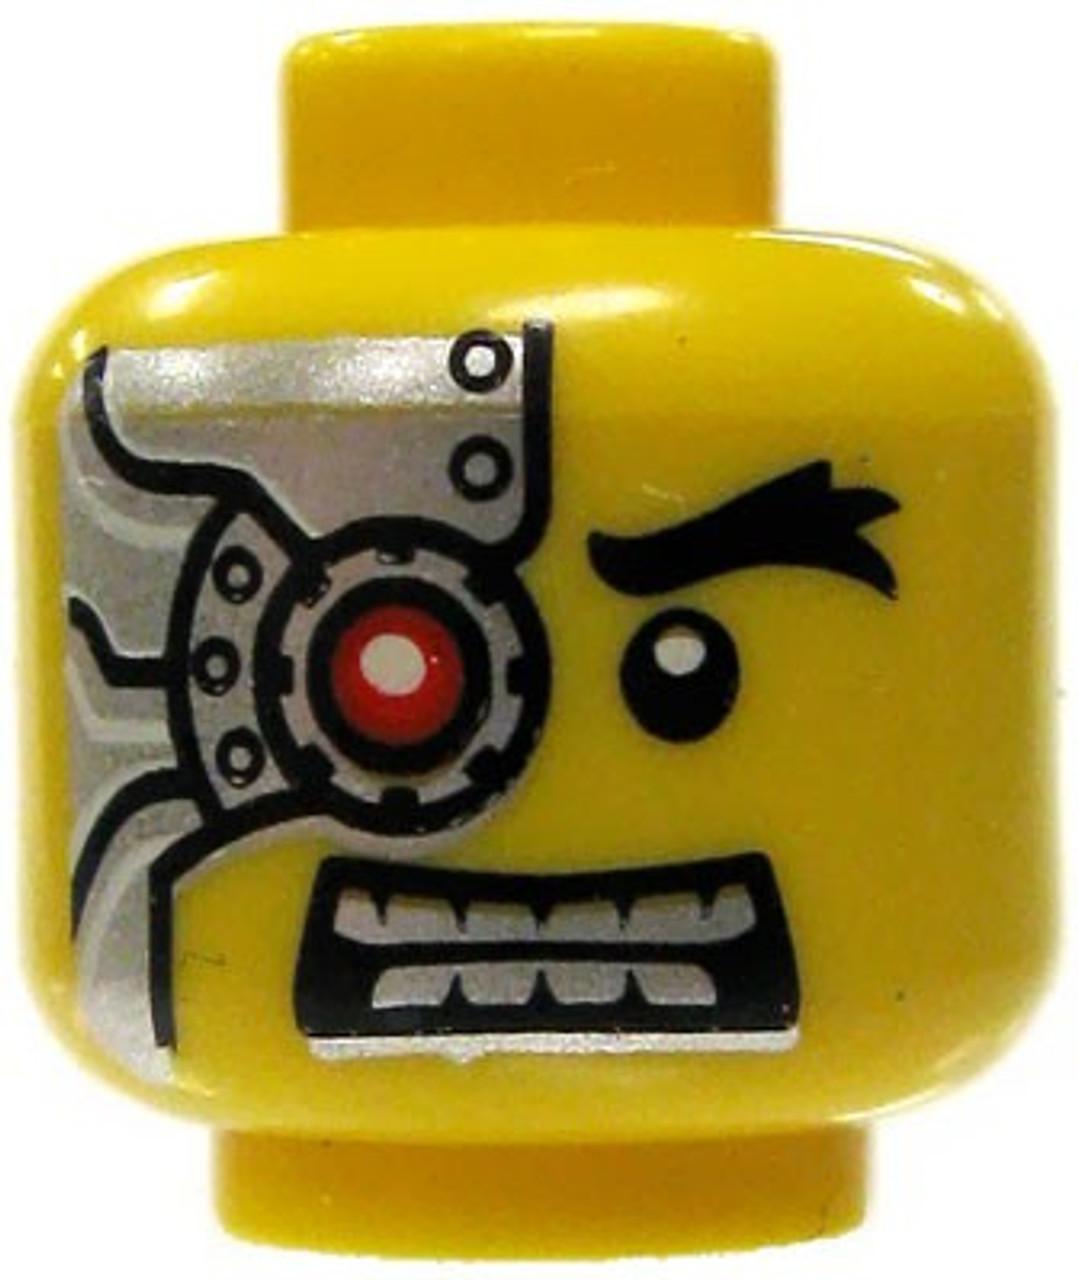 1 x Lego Technic Panele metallic silber Seite A gross Fairing 1 5220 22749 32190